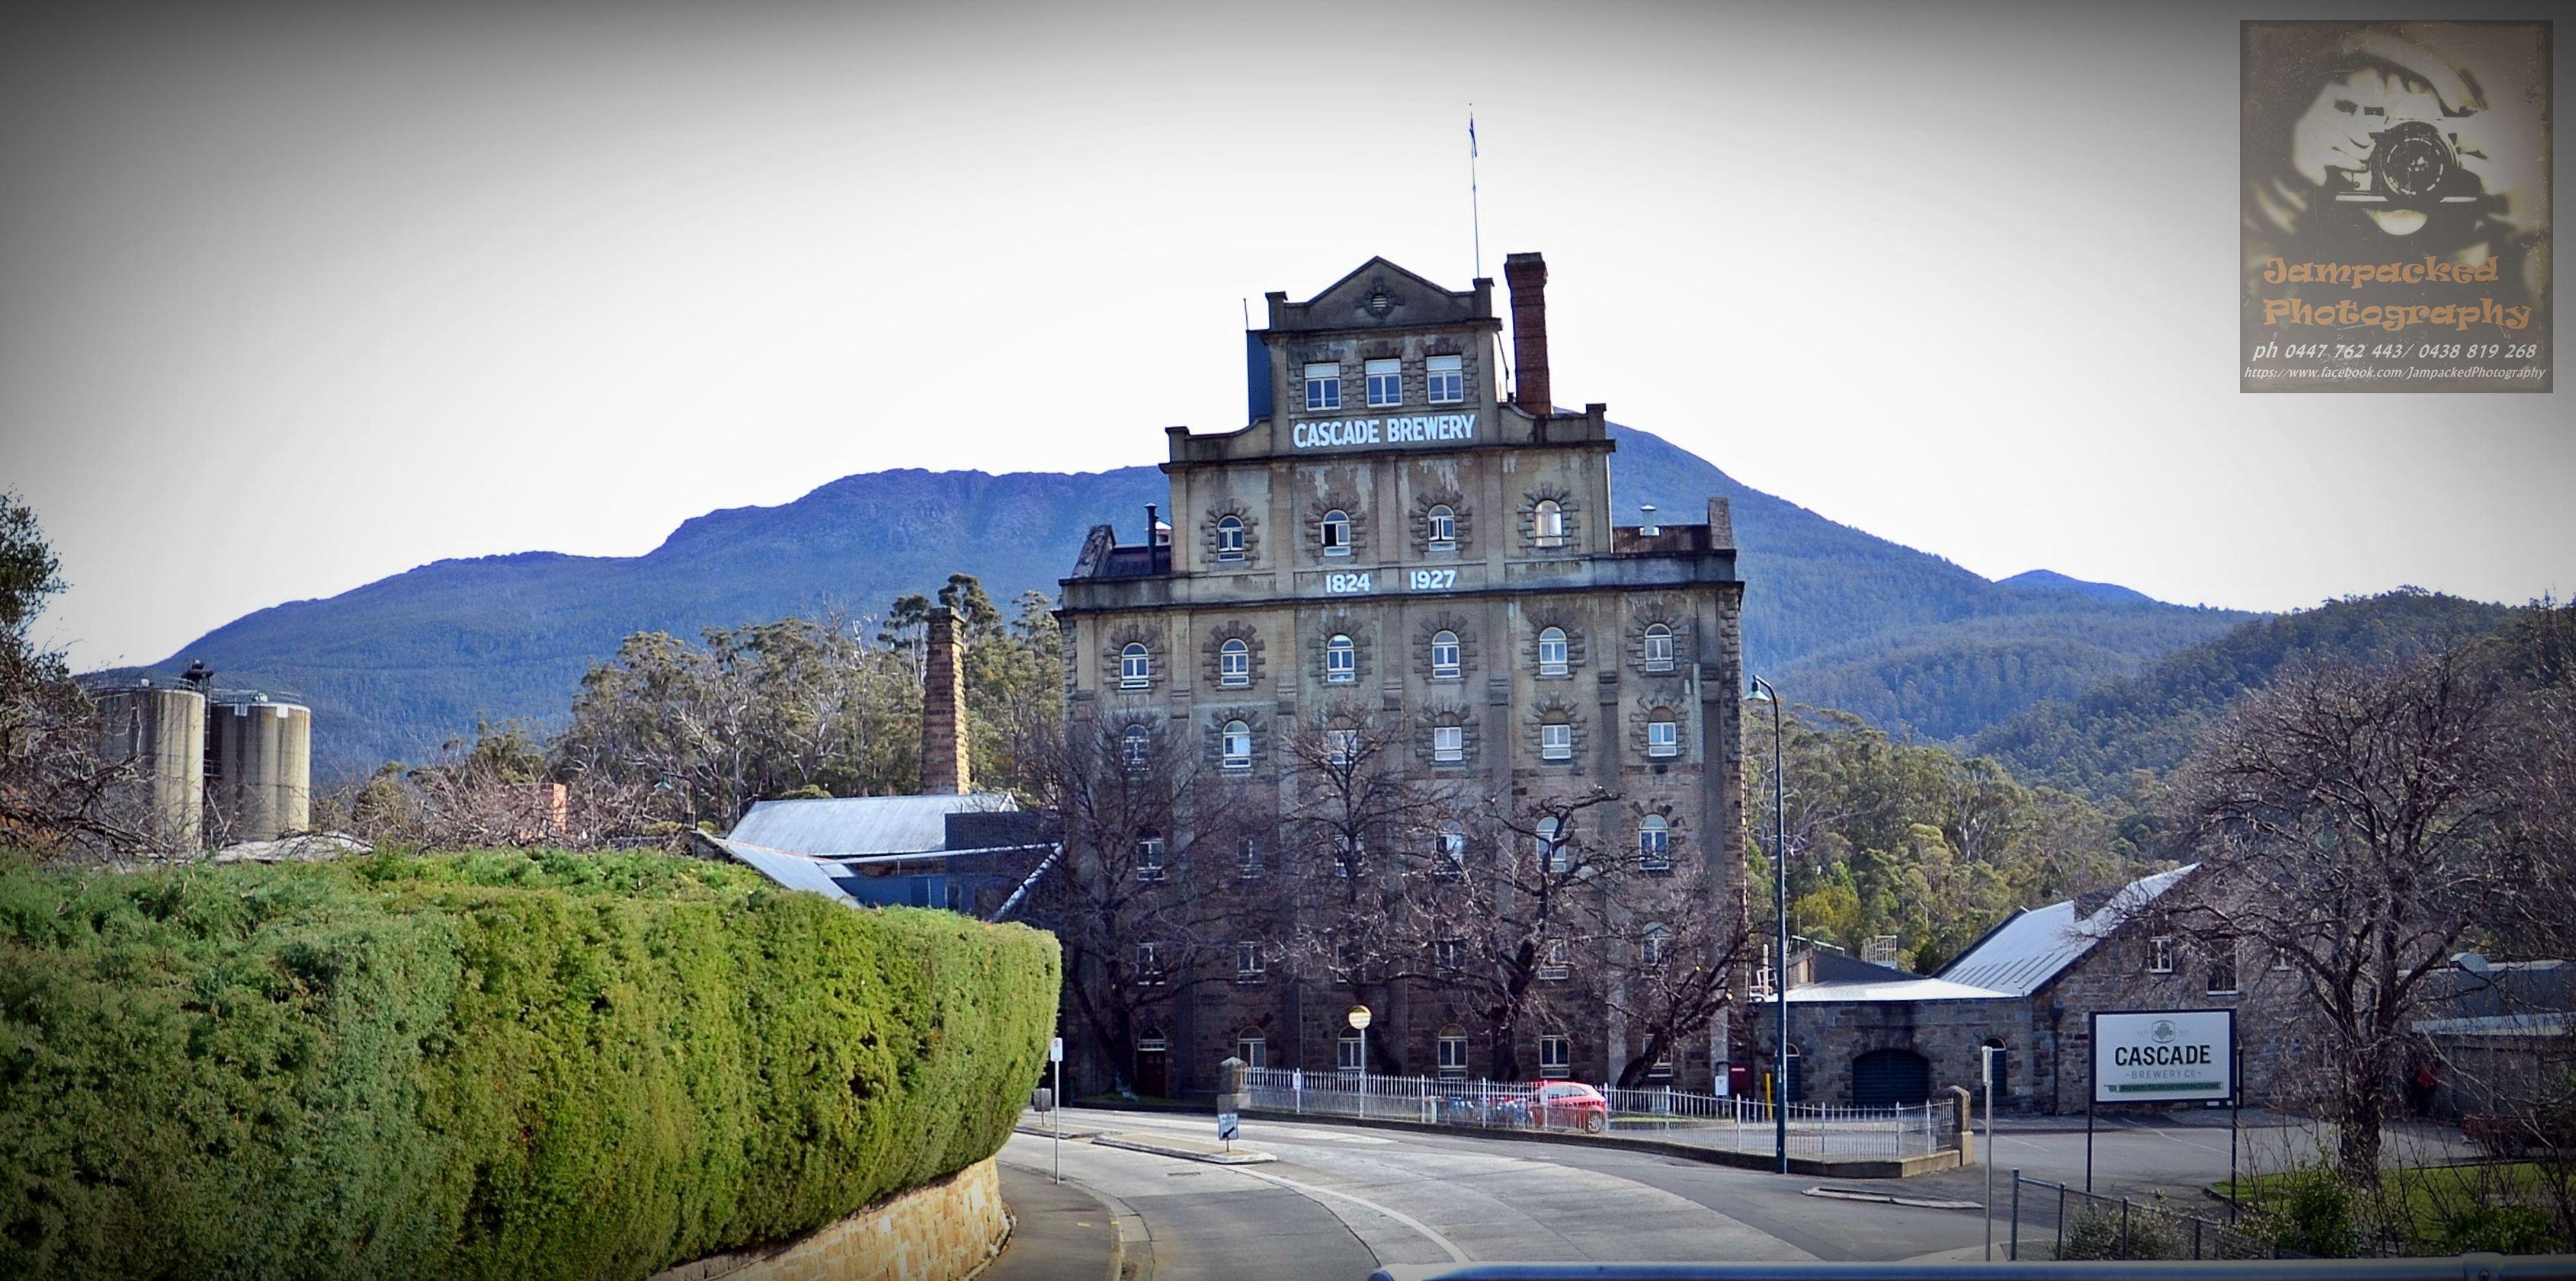 Cascade Brewery Hobart Tasmania See more photos like this